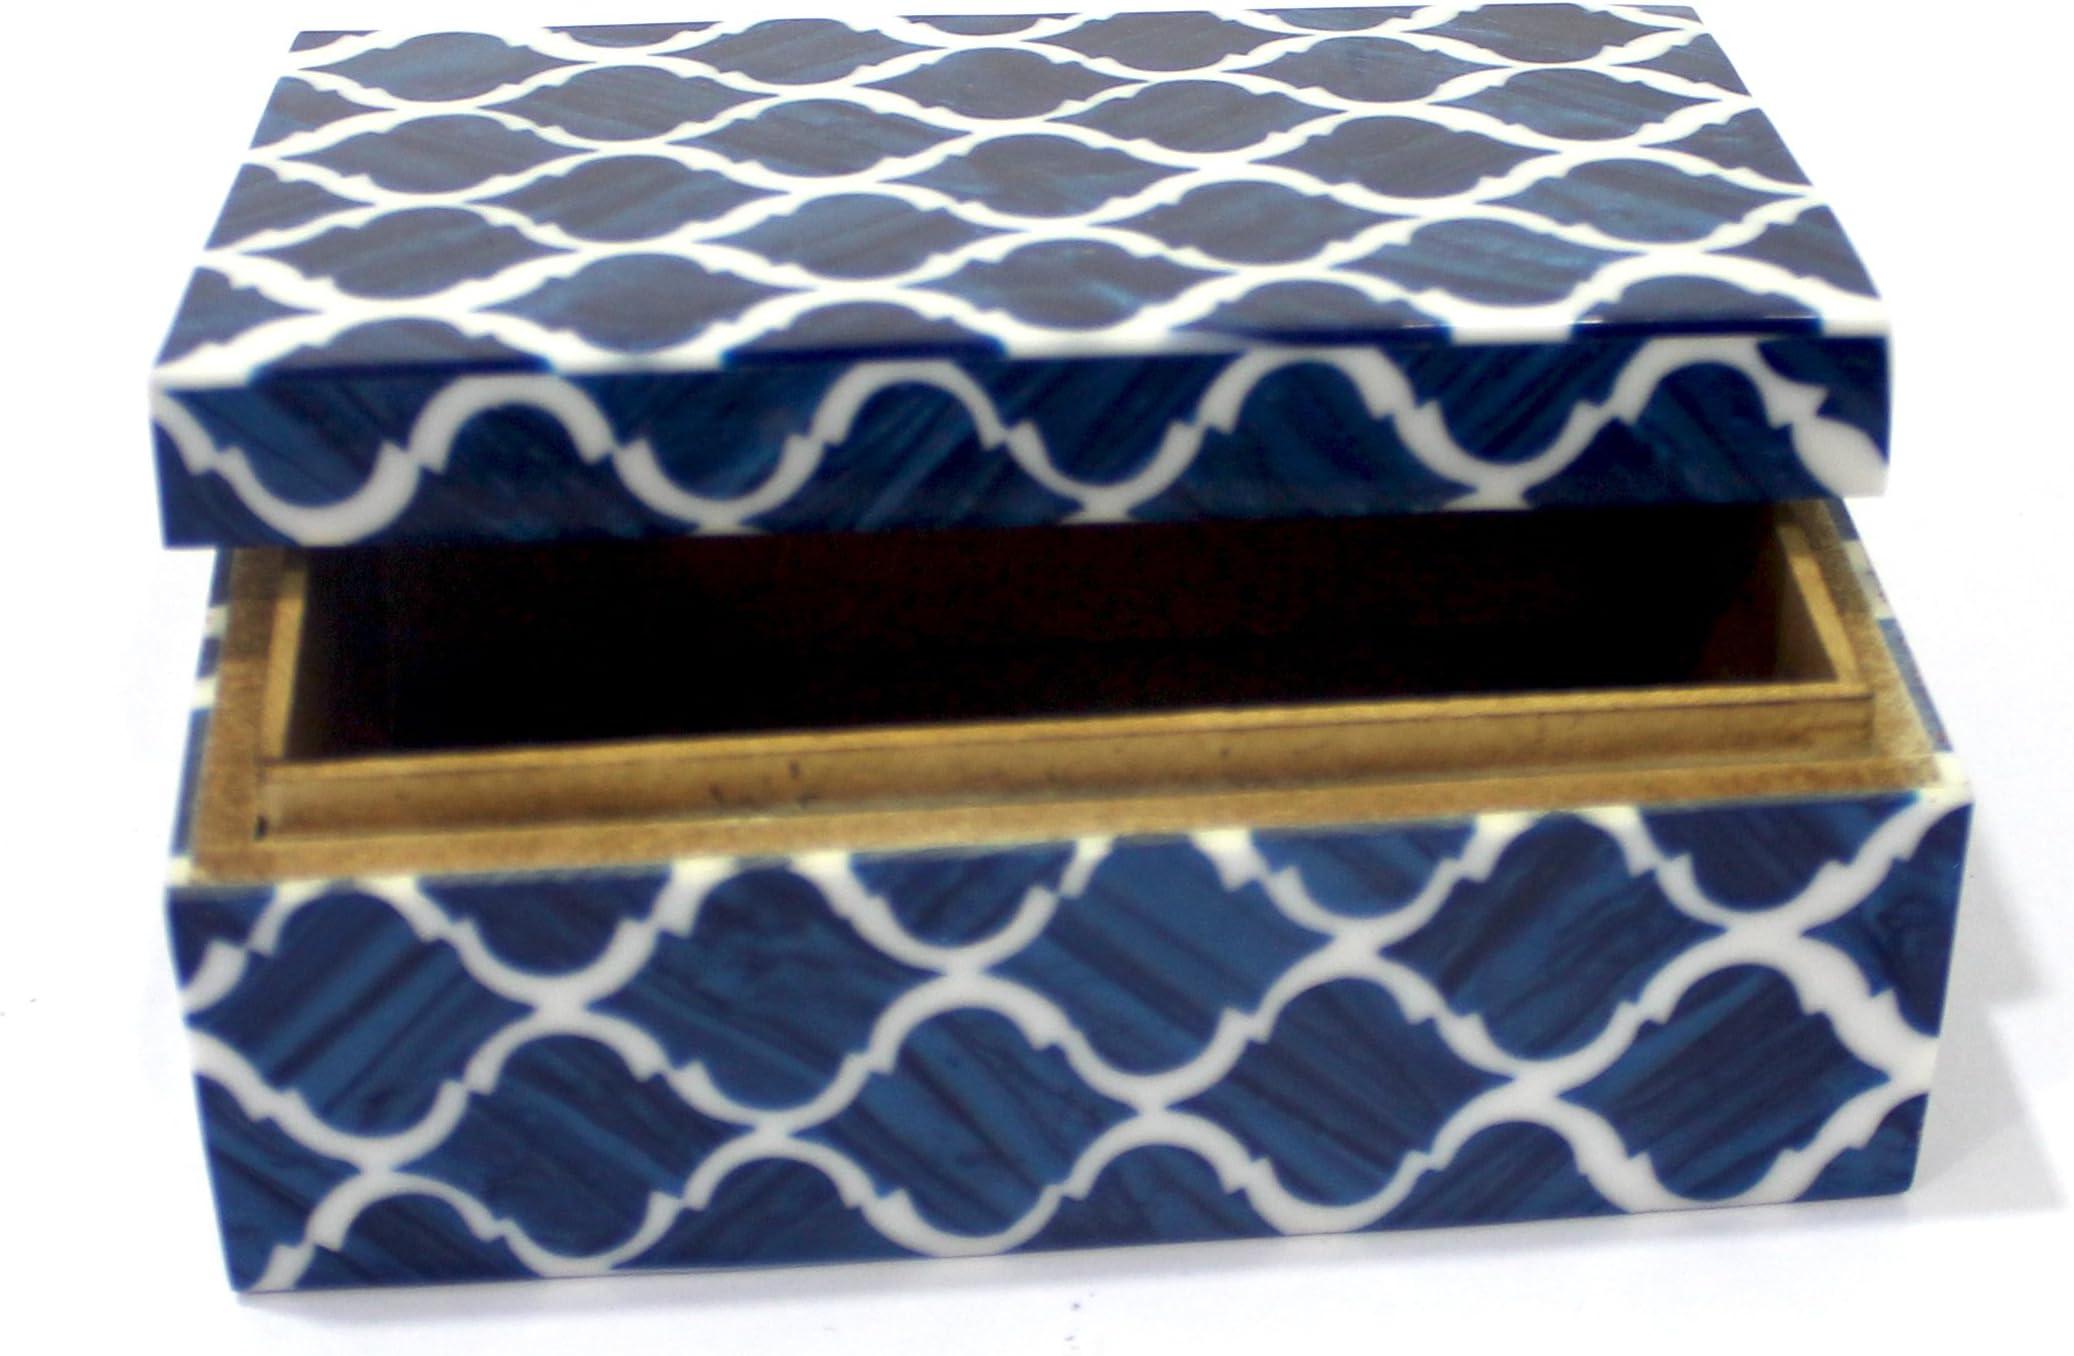 Handmade Bone Horn  Gifts Box Modern Jewelry Gifts Box Unique Antique Box Smart Black and White Storage Box